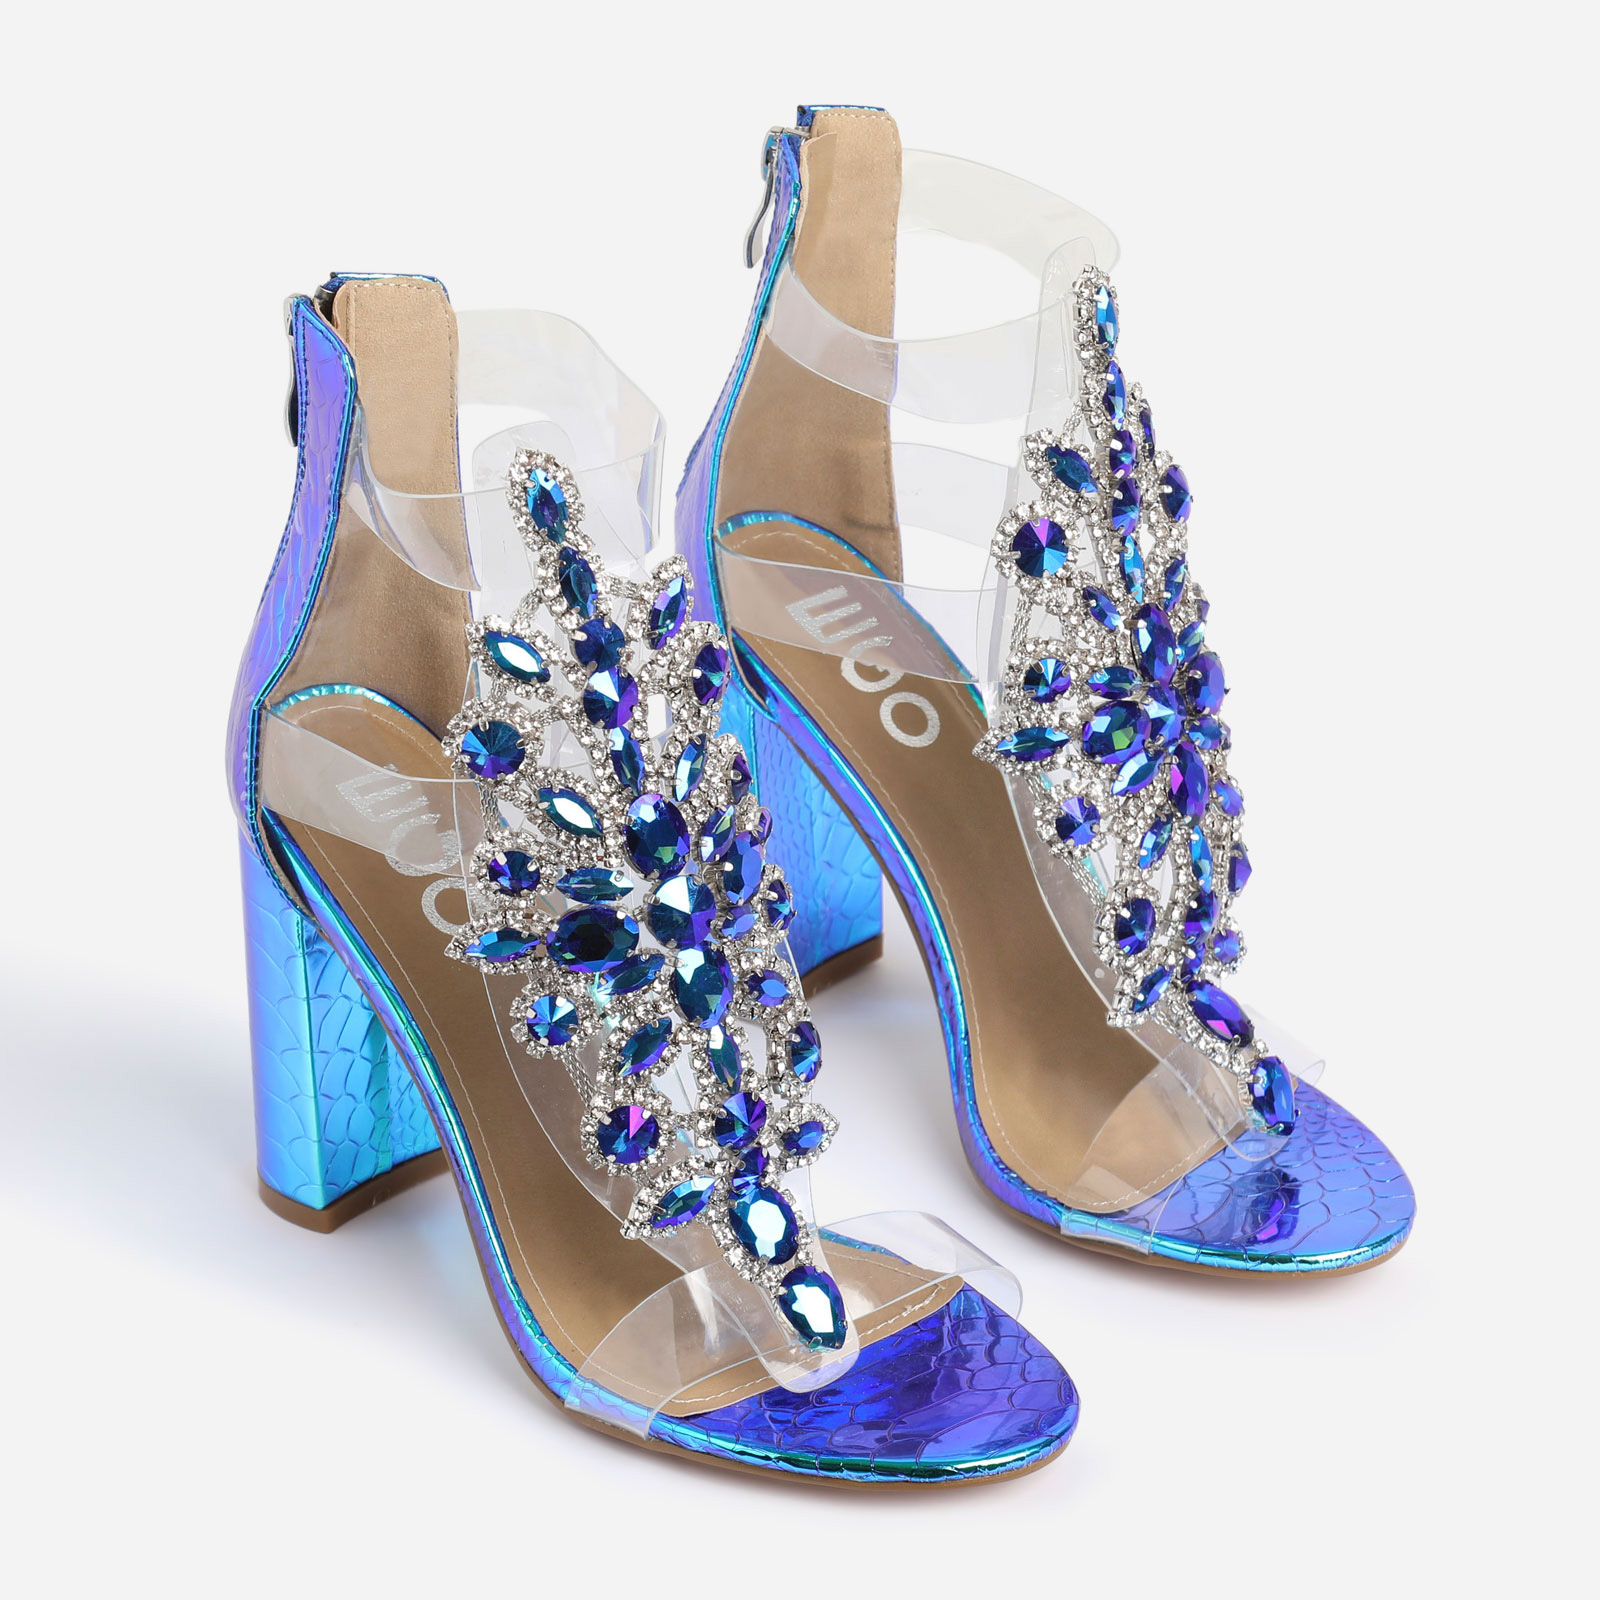 Tatum Jewel Embellished Block Heel In Blue Holographic Snake Print Faux Leather